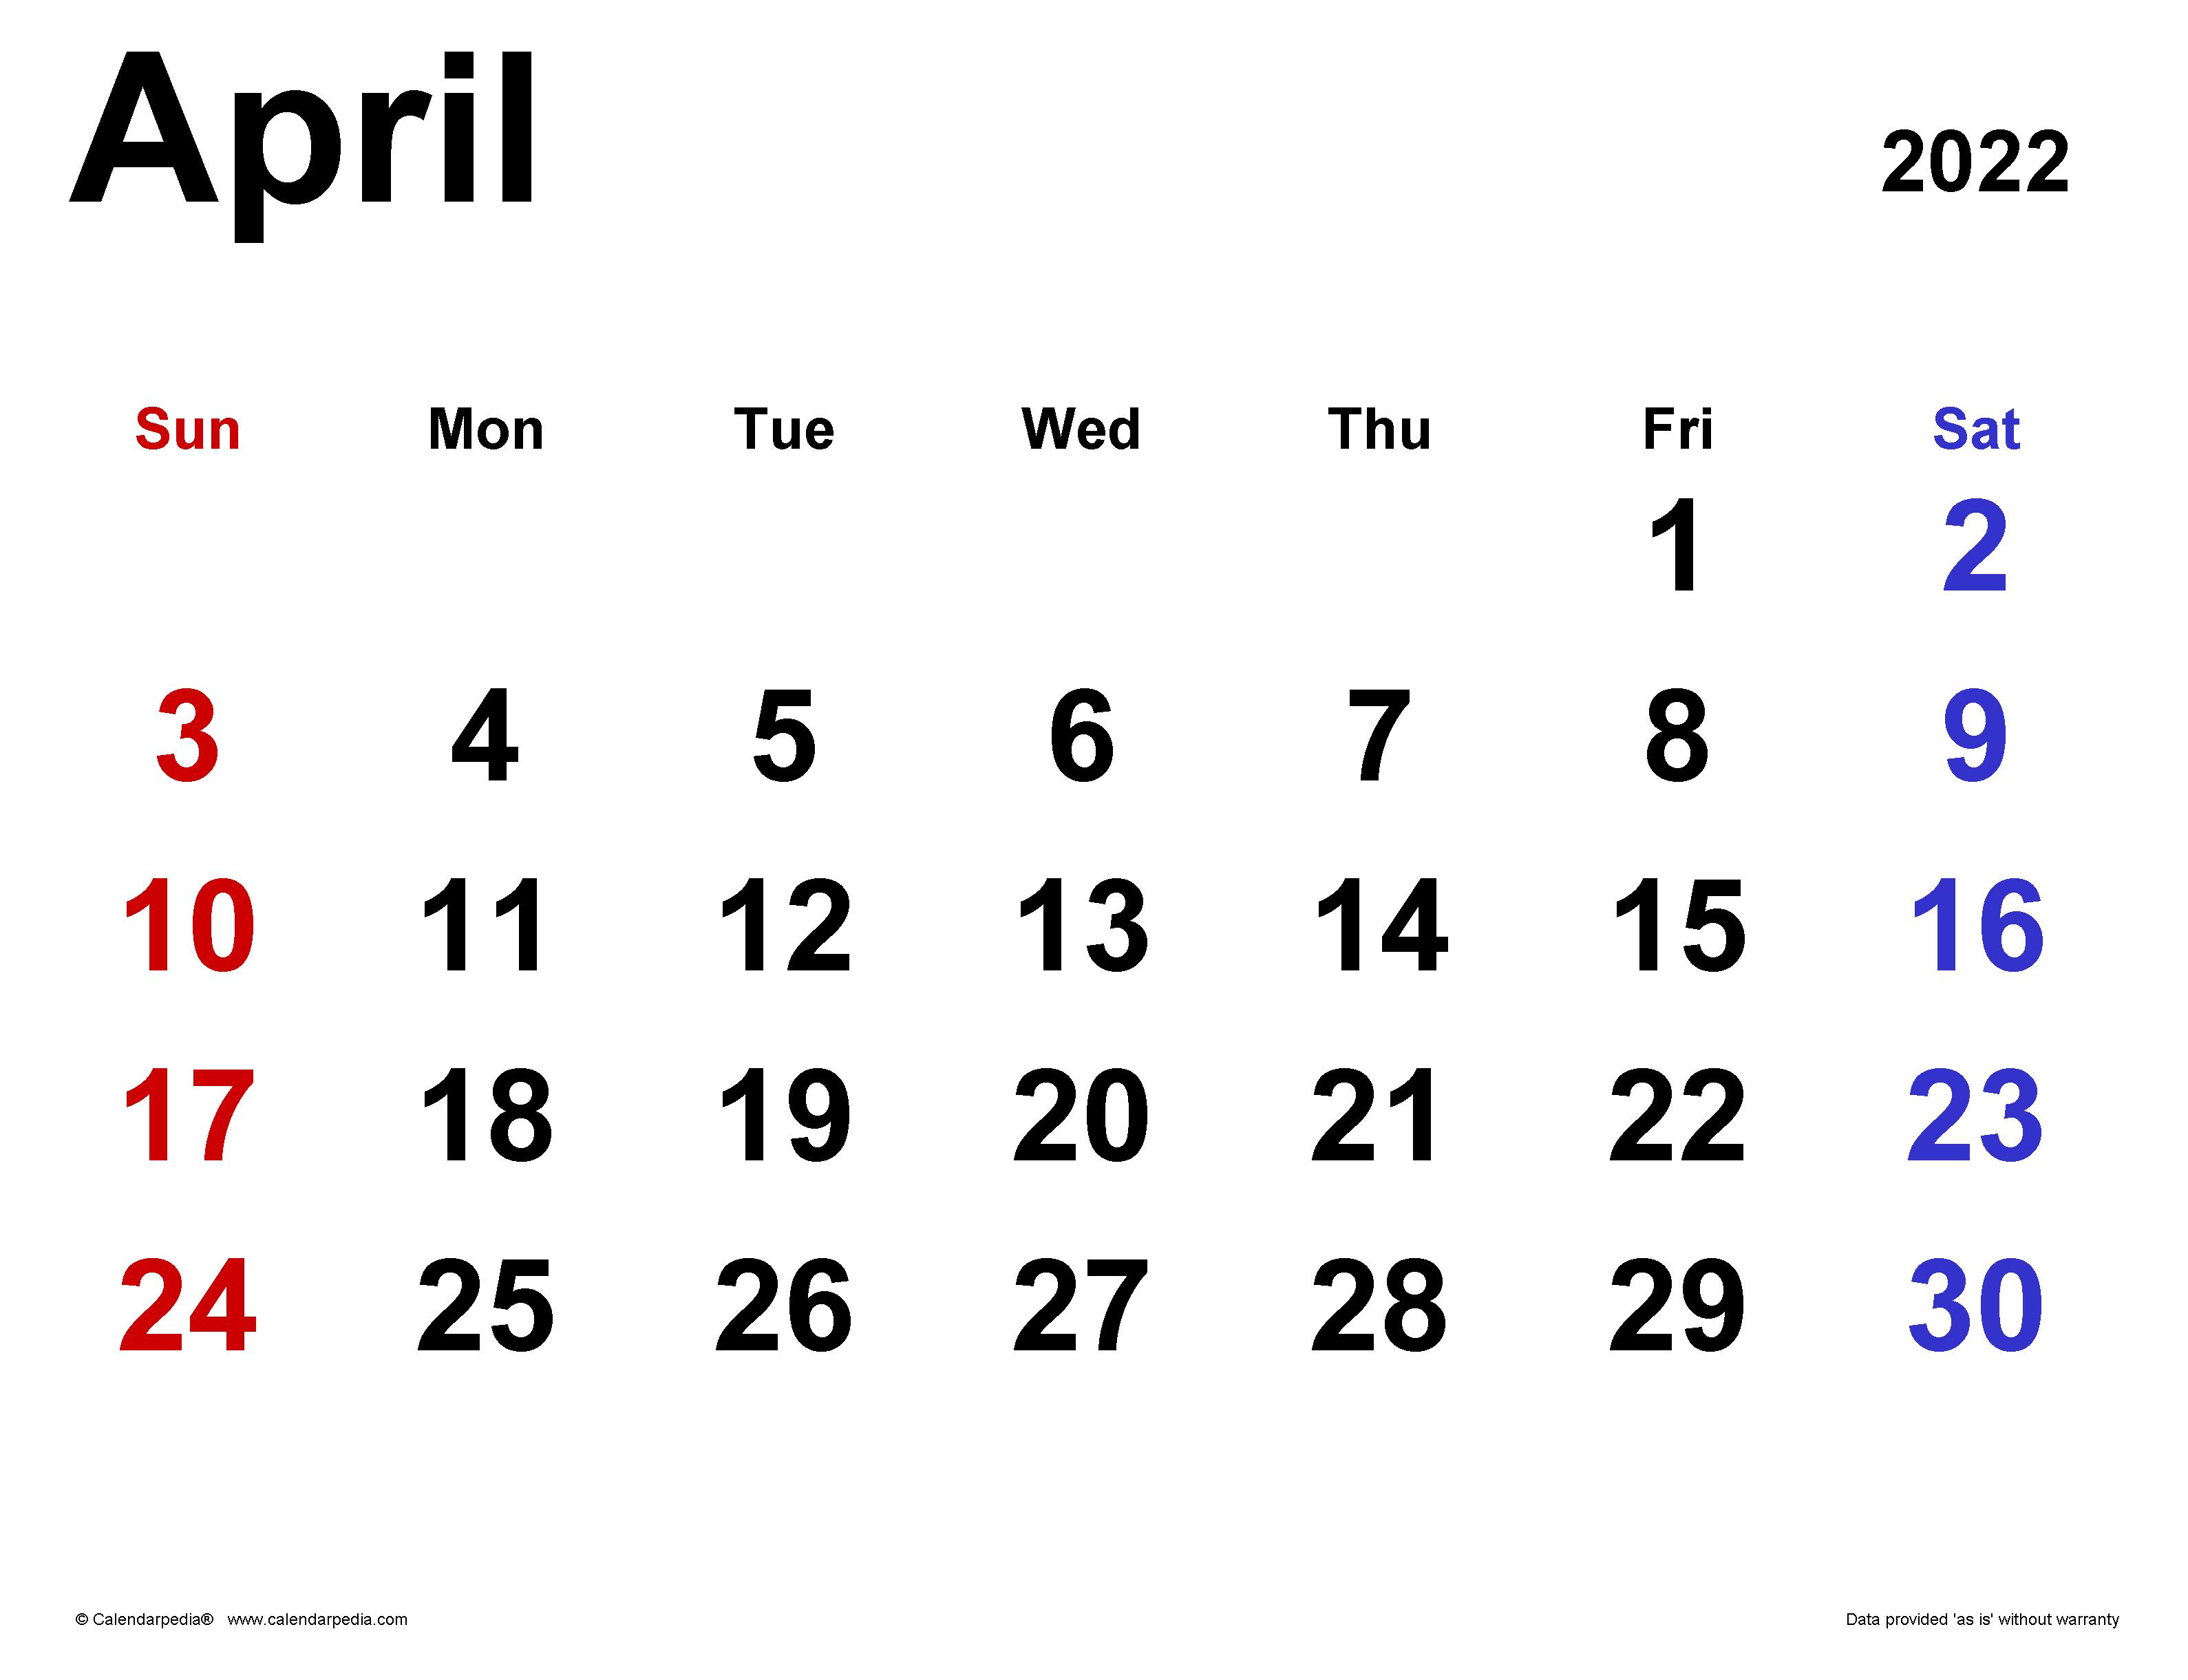 Apr 2022 Calendar.April 2022 Calendar Templates For Word Excel And Pdf